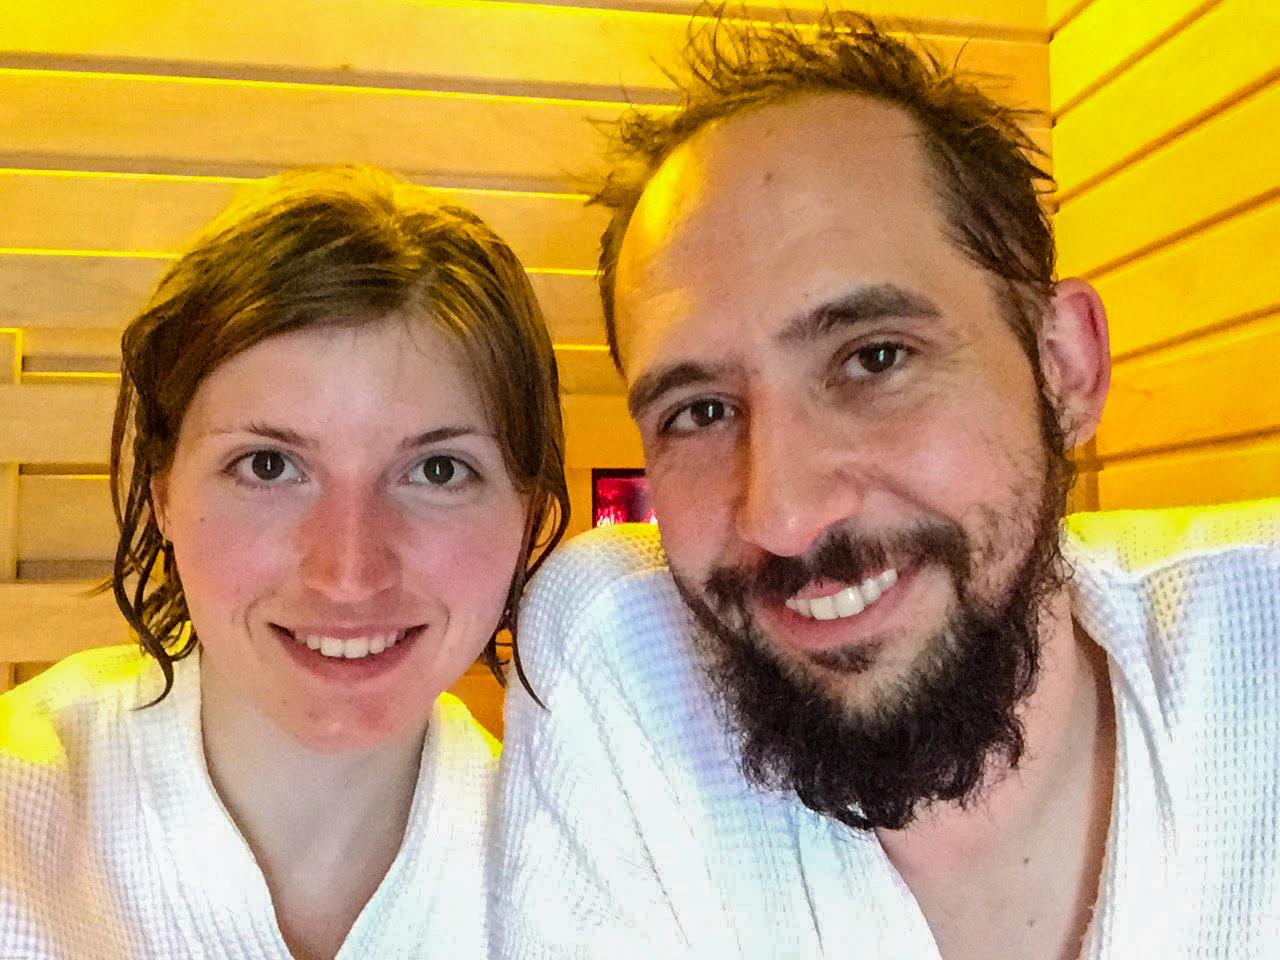 Obligatory non-selfie of the nerds in the sauna!